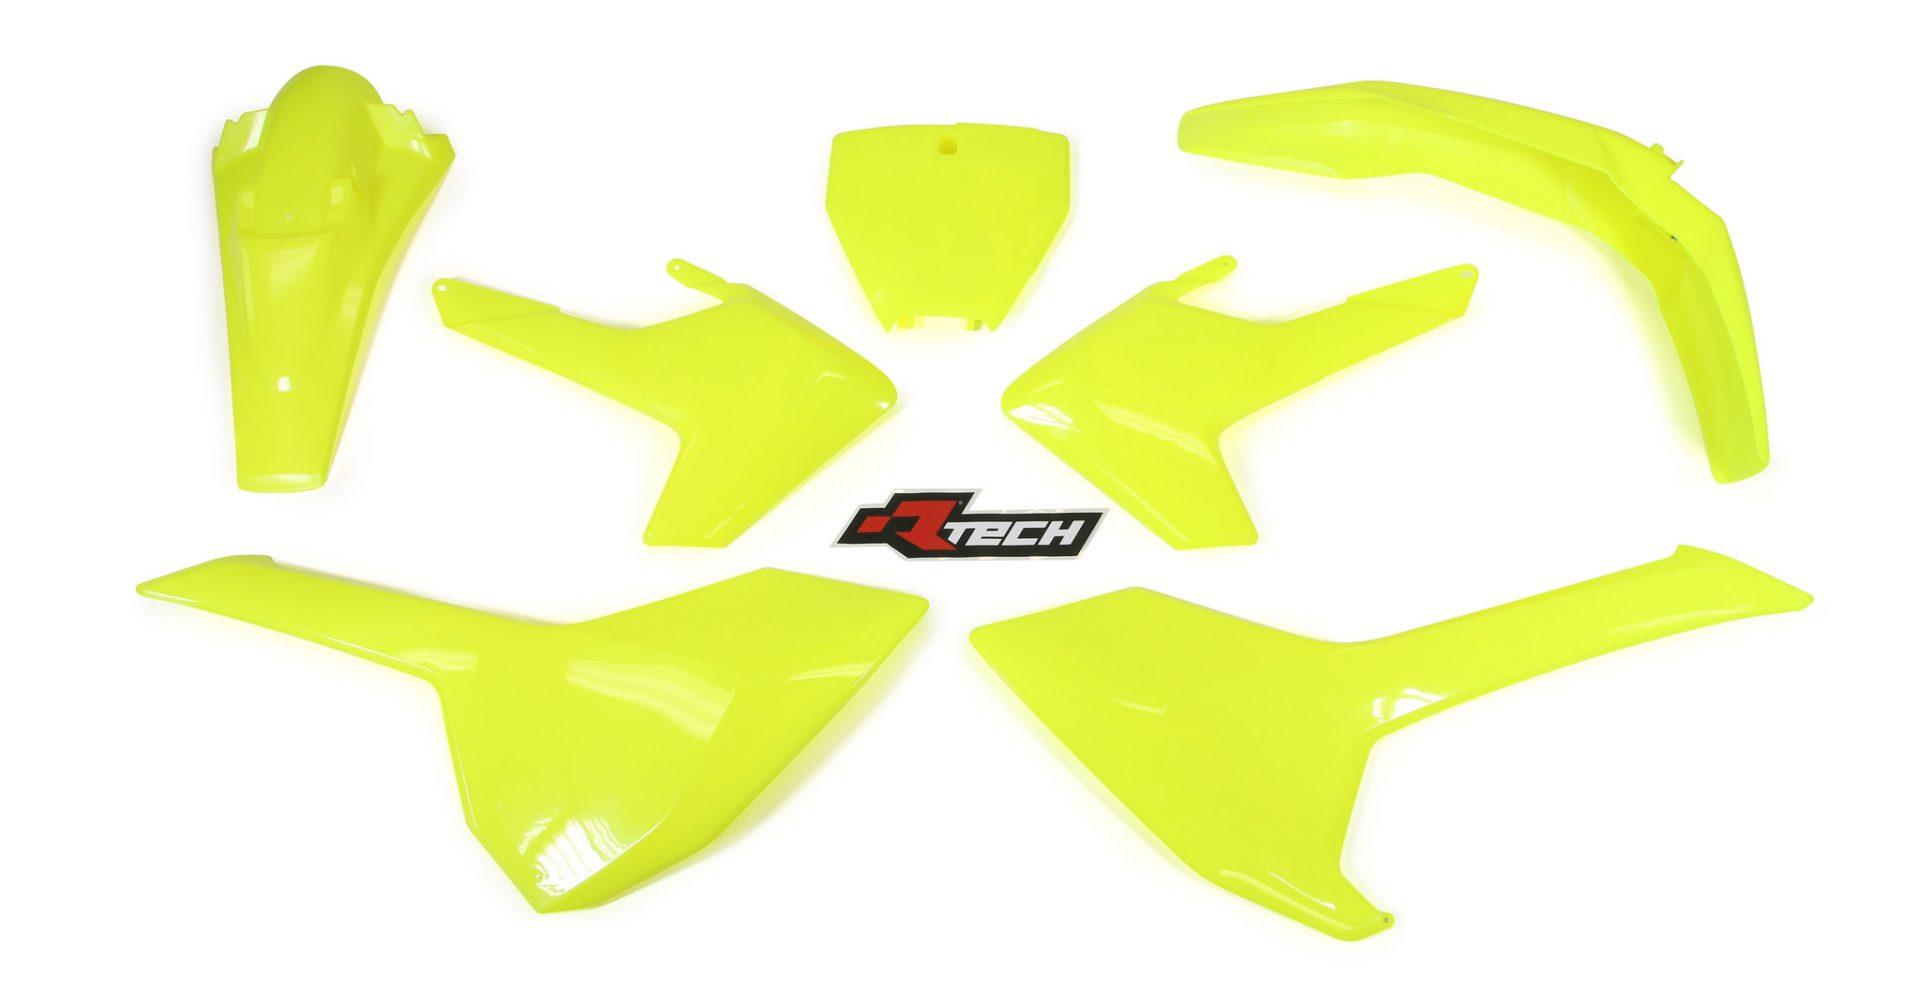 Neon yellow kit rival ink design co custom motocross graphics - Rtech